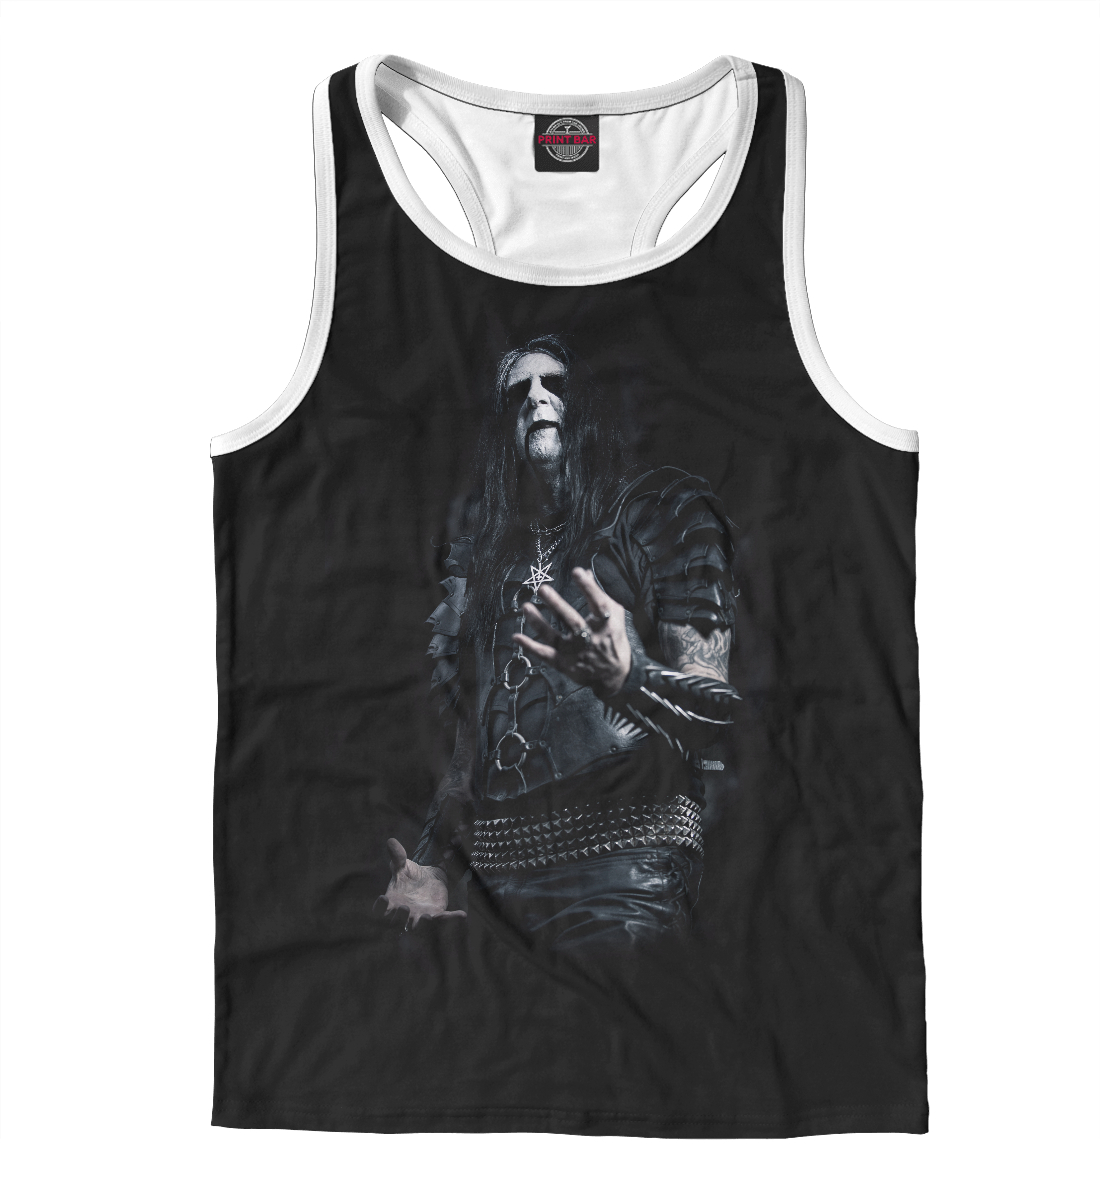 Купить Dark Funeral, Printbar, Майки борцовки, MZK-532087-mayb-2